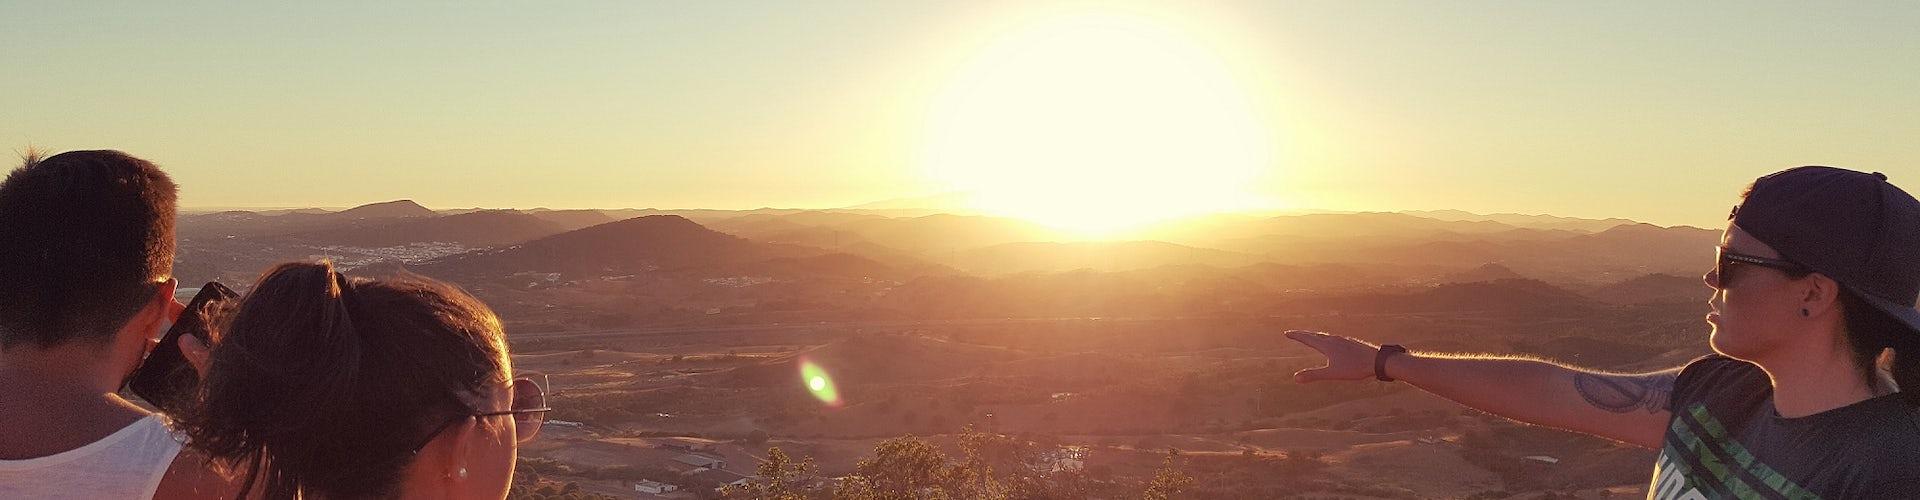 New Sunset 3